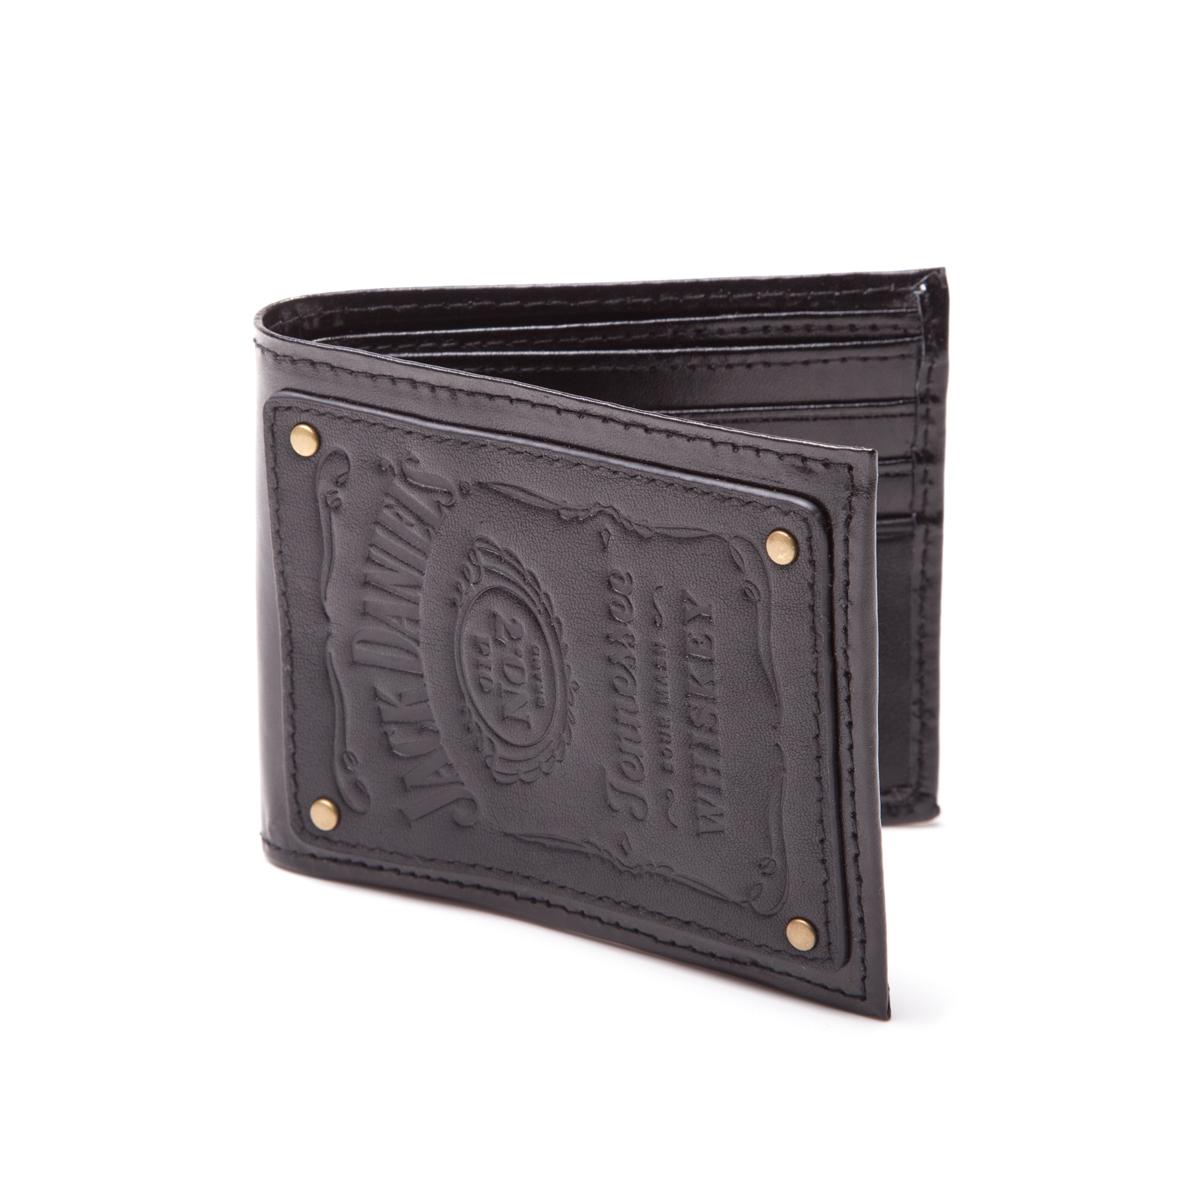 Jack Daniel's Bifold Wallet Leather Patch